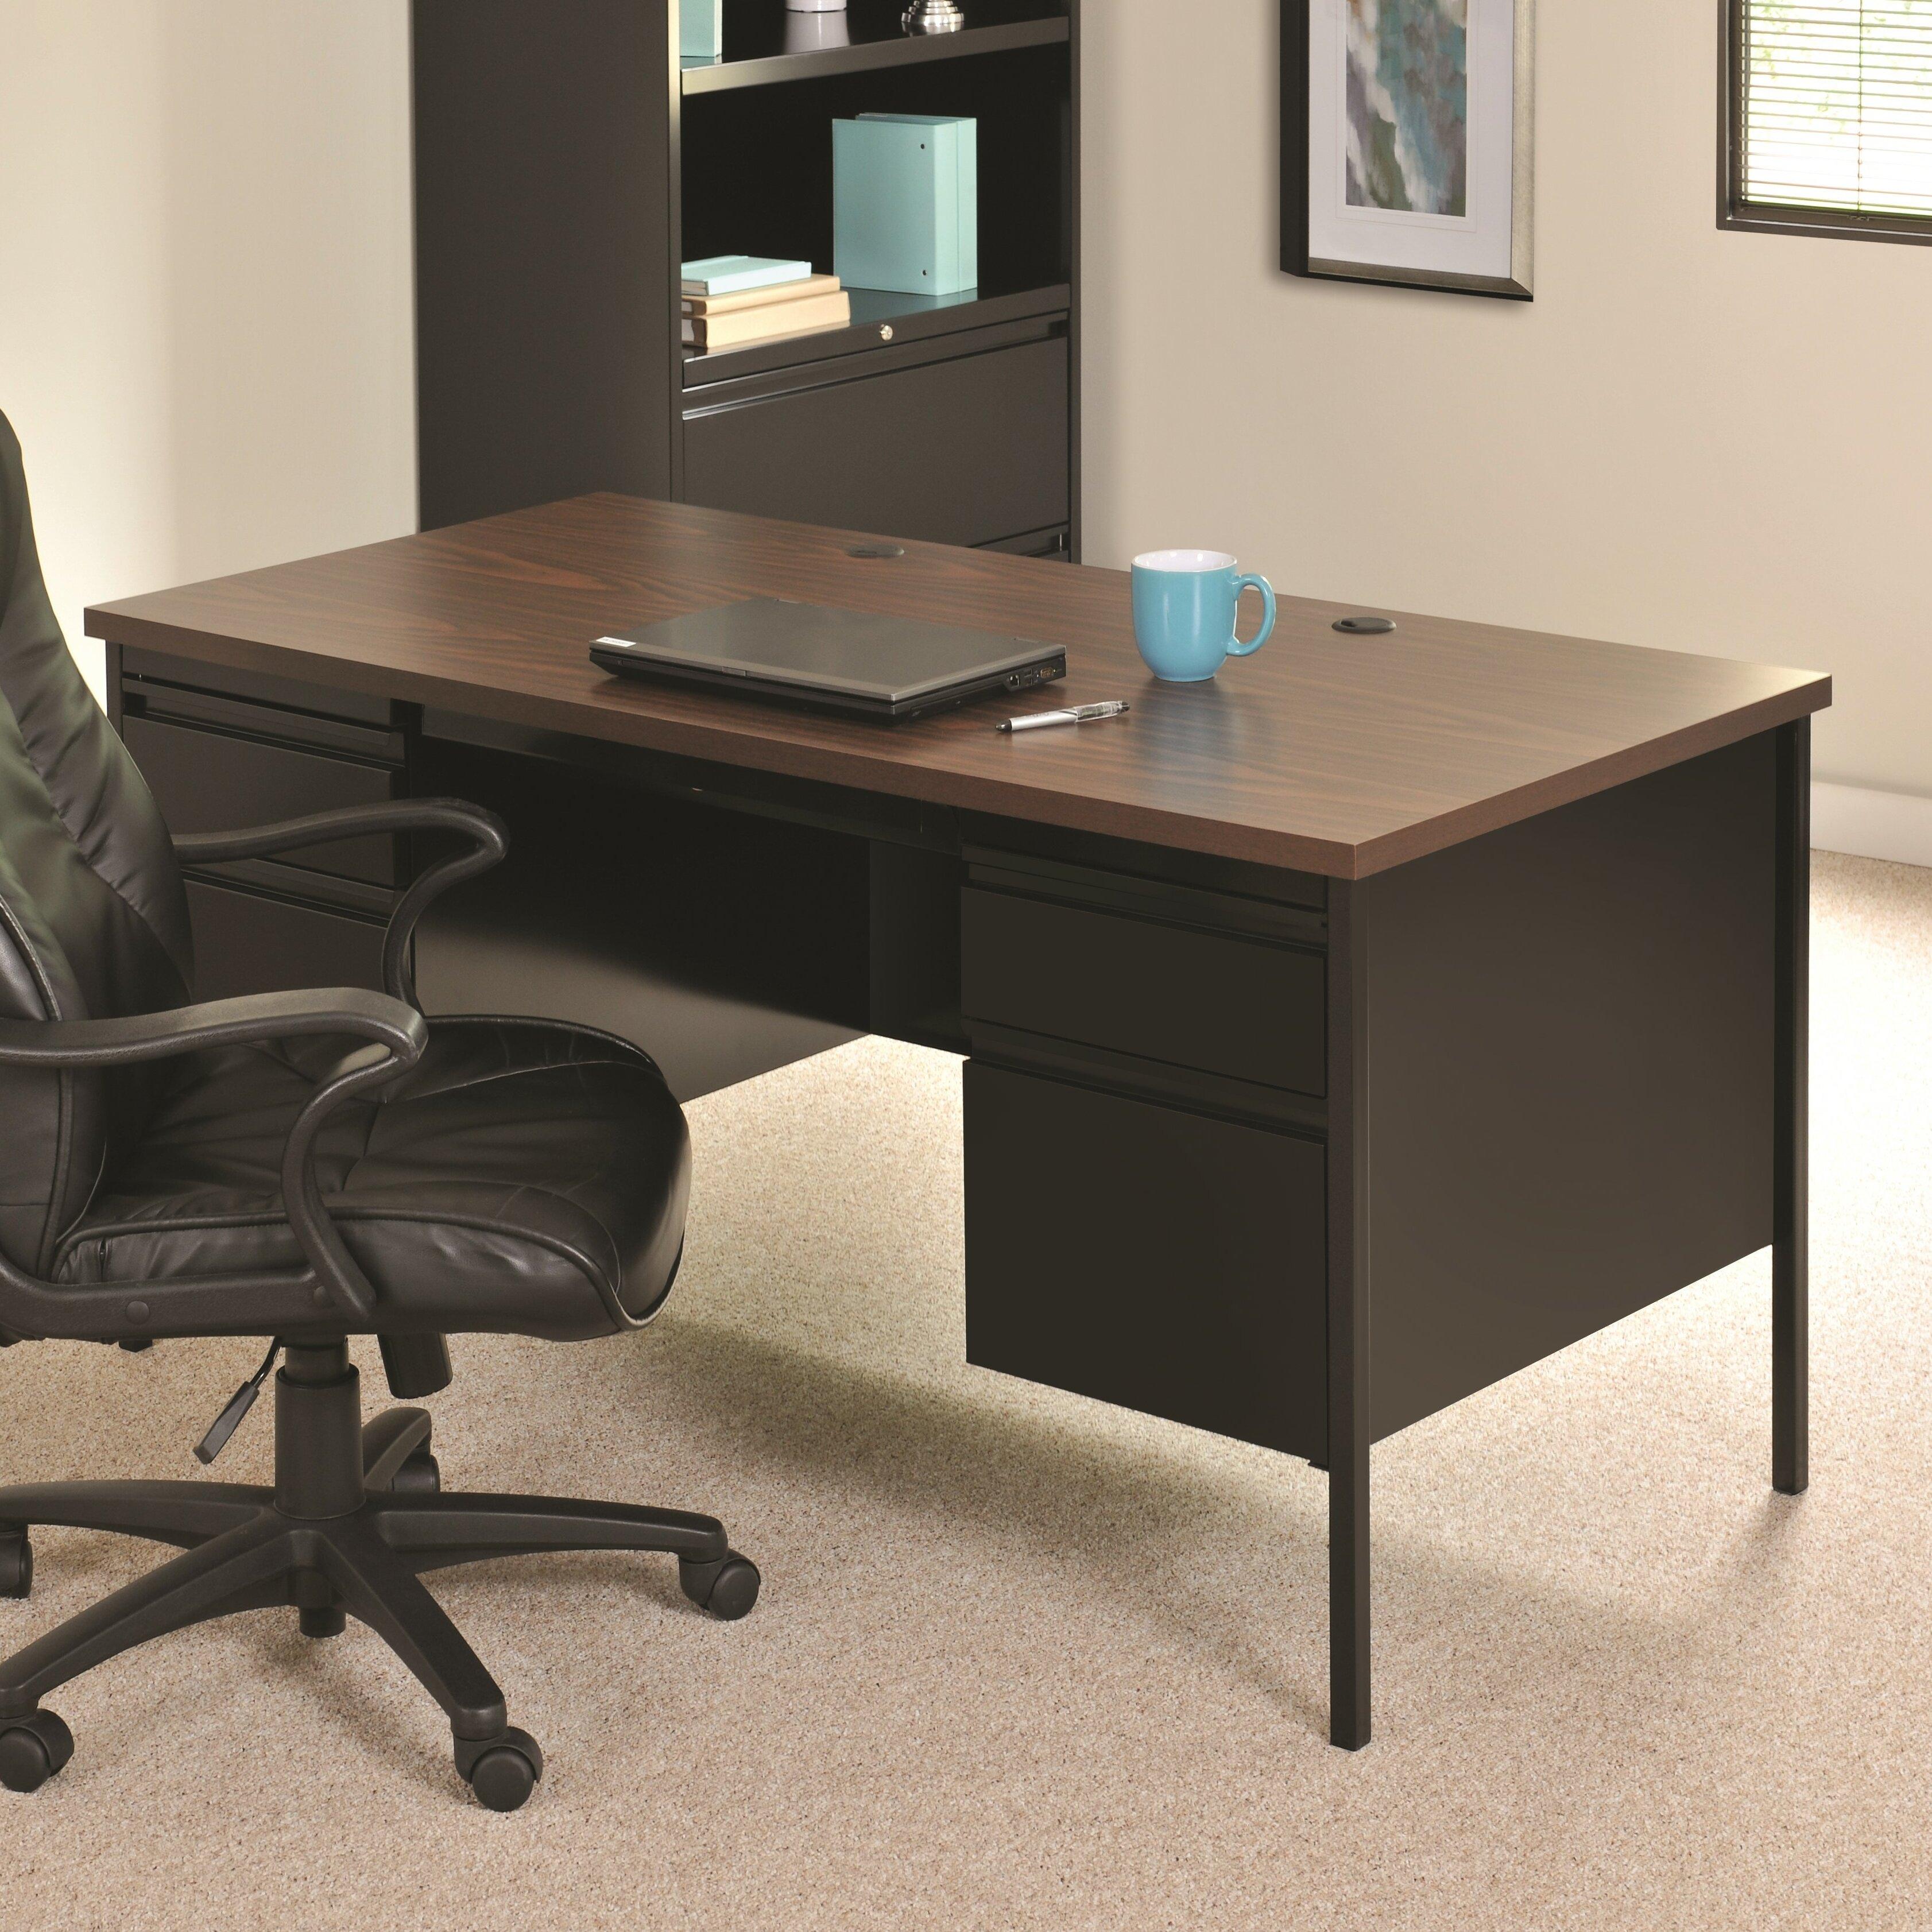 Commclad Hl10000 Series Doulble Pedestal Computer Desk Reviews Wayfair